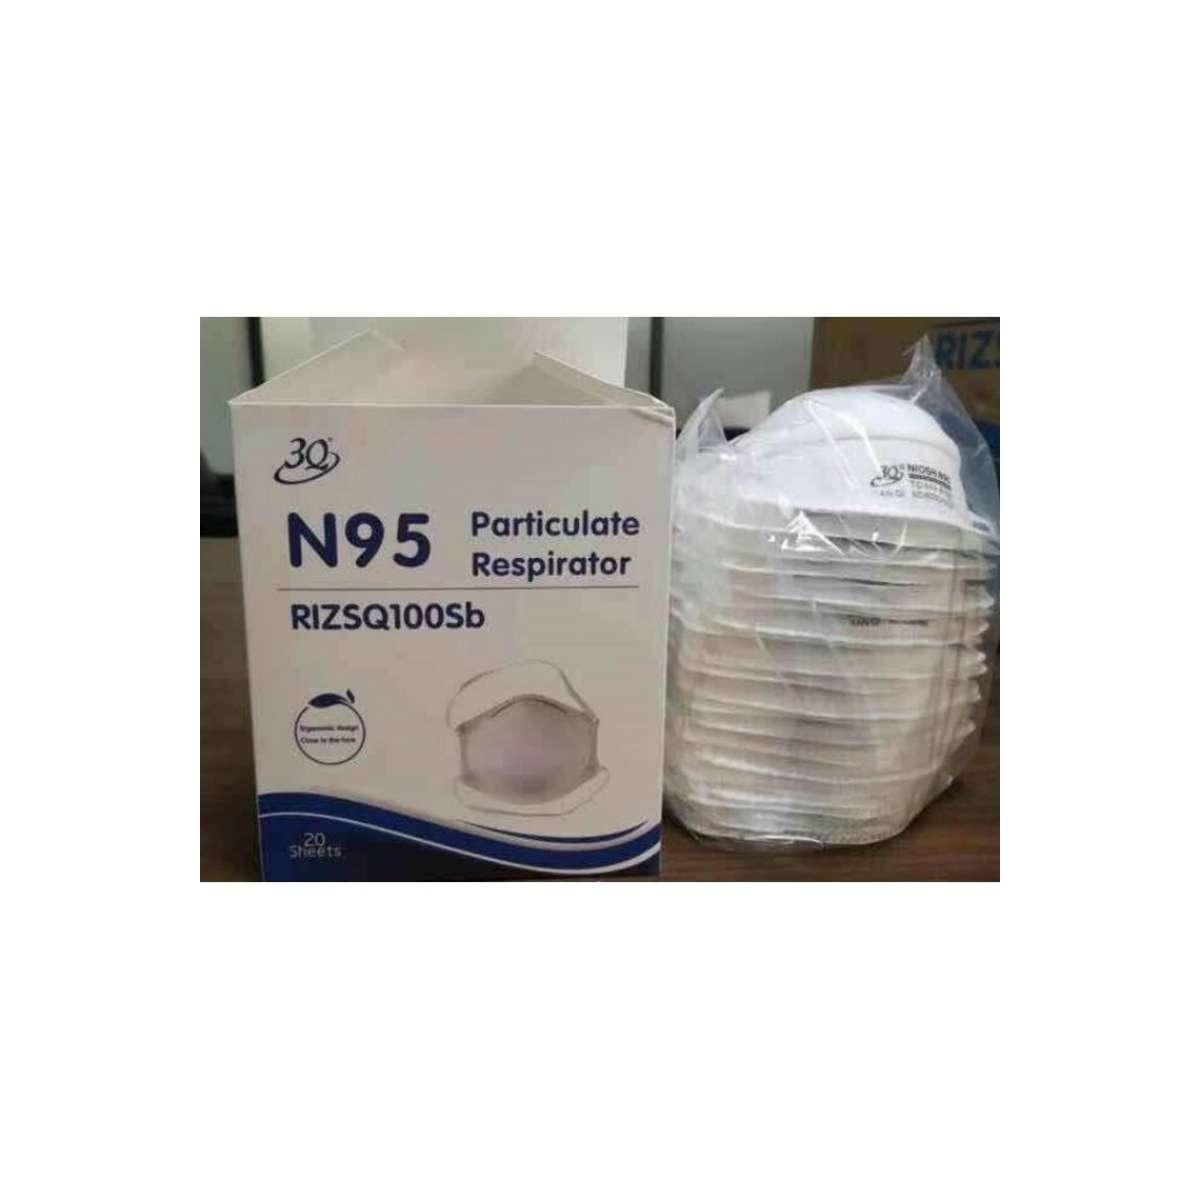 N95 NIOSH or N95 FDA Respirator Mask - Cup - Case of 480